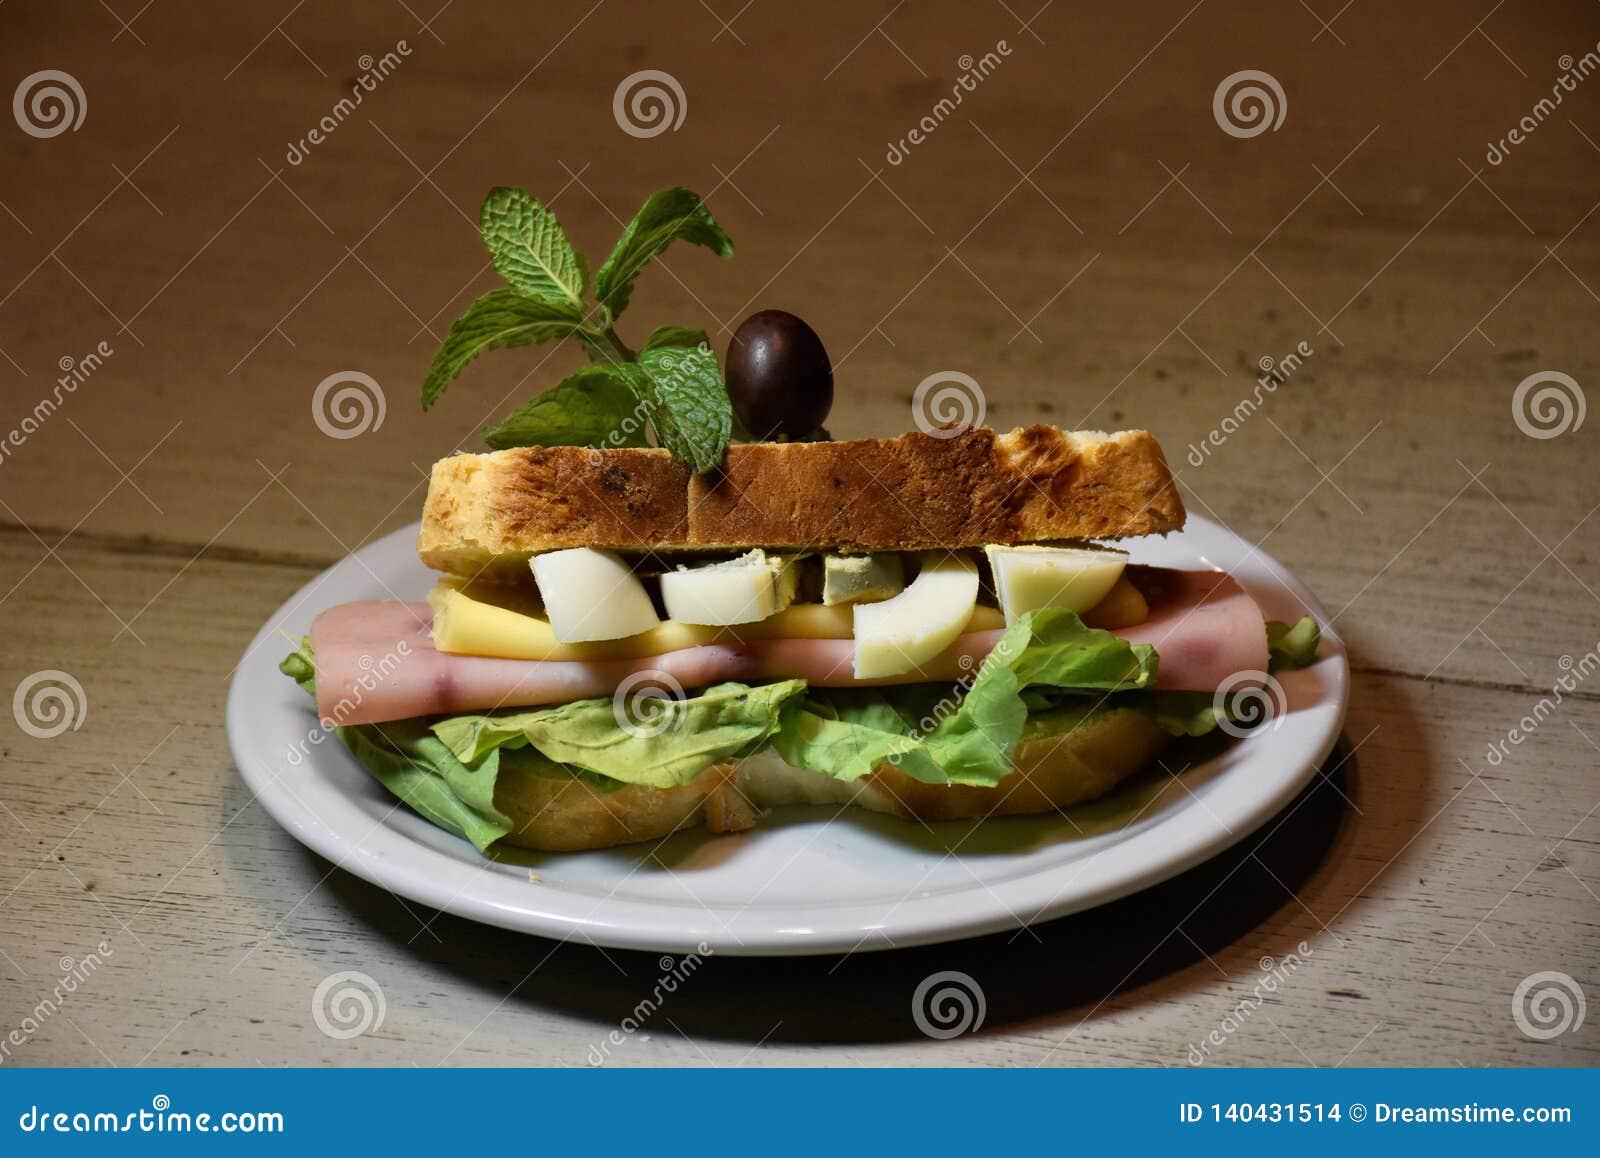 Sandwich typique à jambon